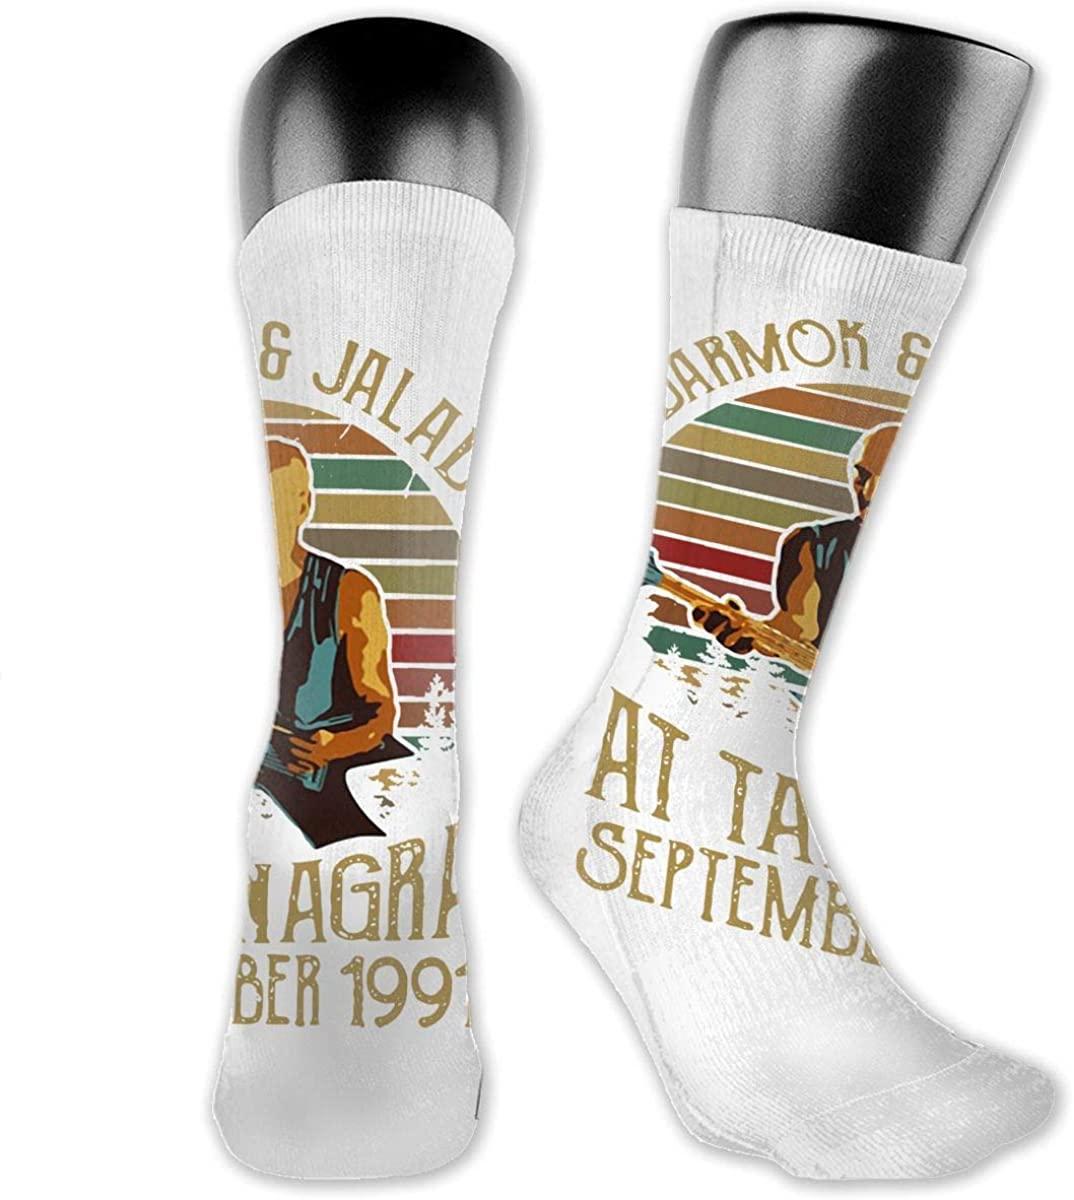 Darmok-Jalad Medium Long Socks Dress Hose Soccer Short Anklet For Training